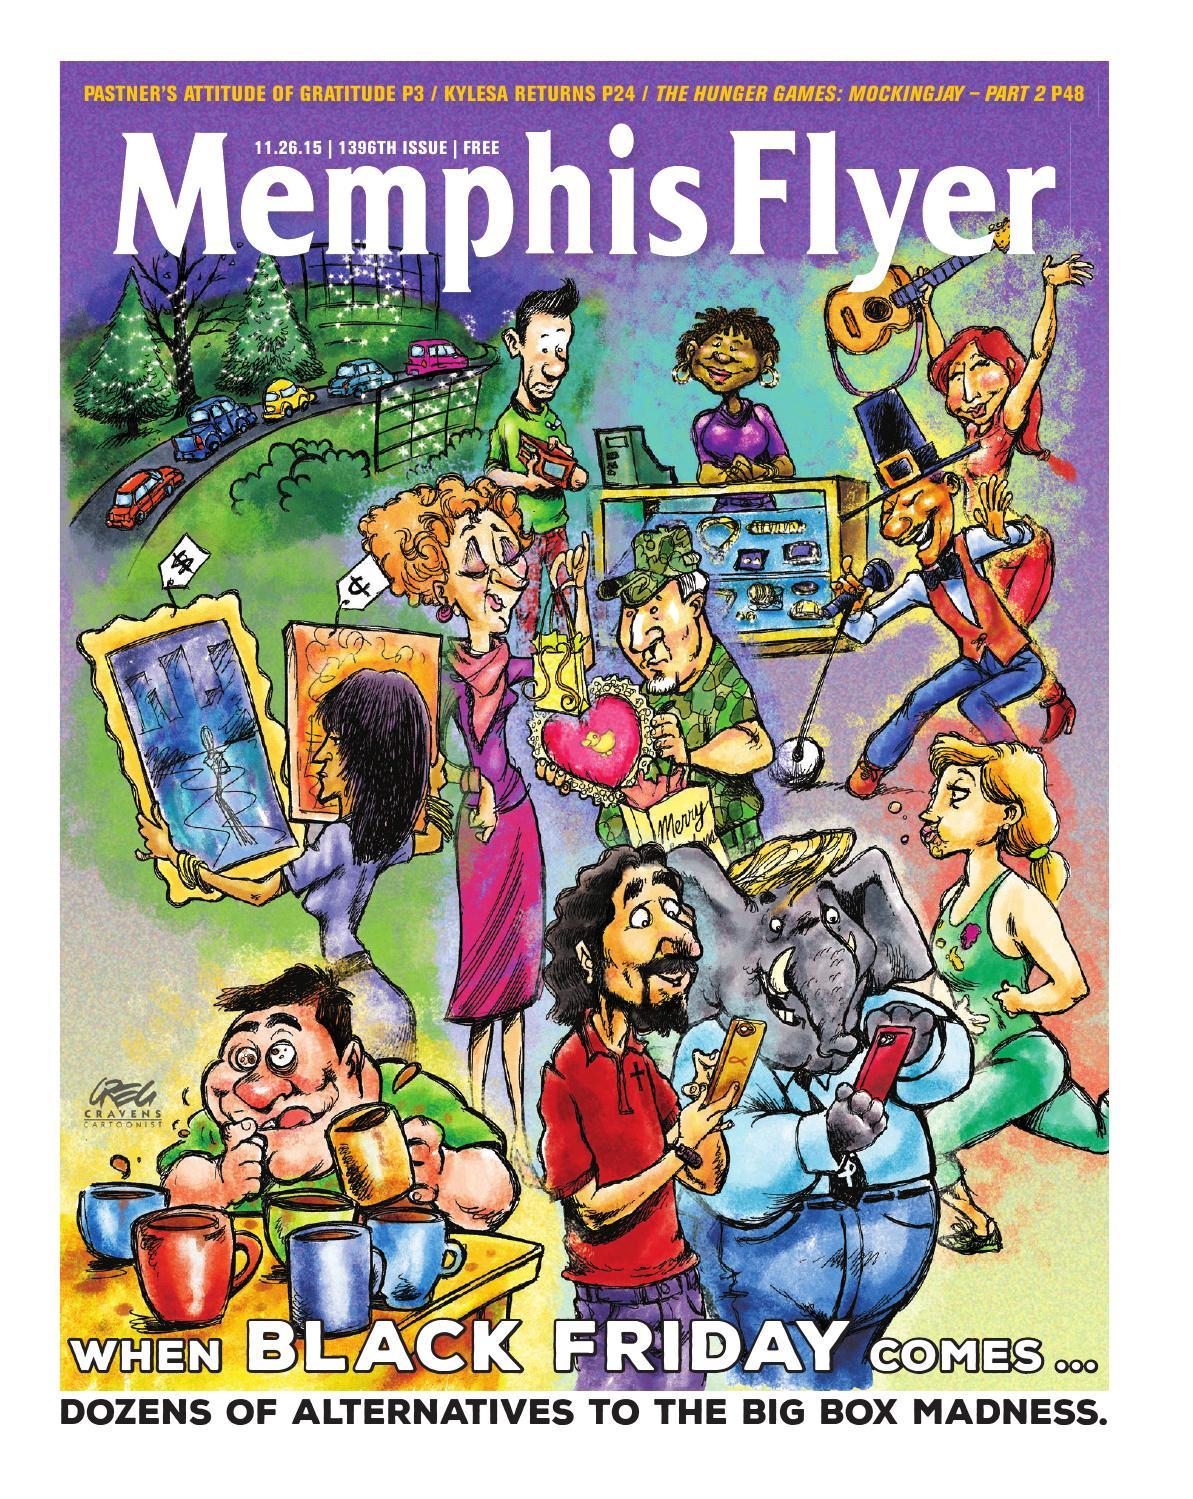 Cobb County School Calendar 2020 19.Memphis Flyer 11 26 15 By Contemporary Media Issuu